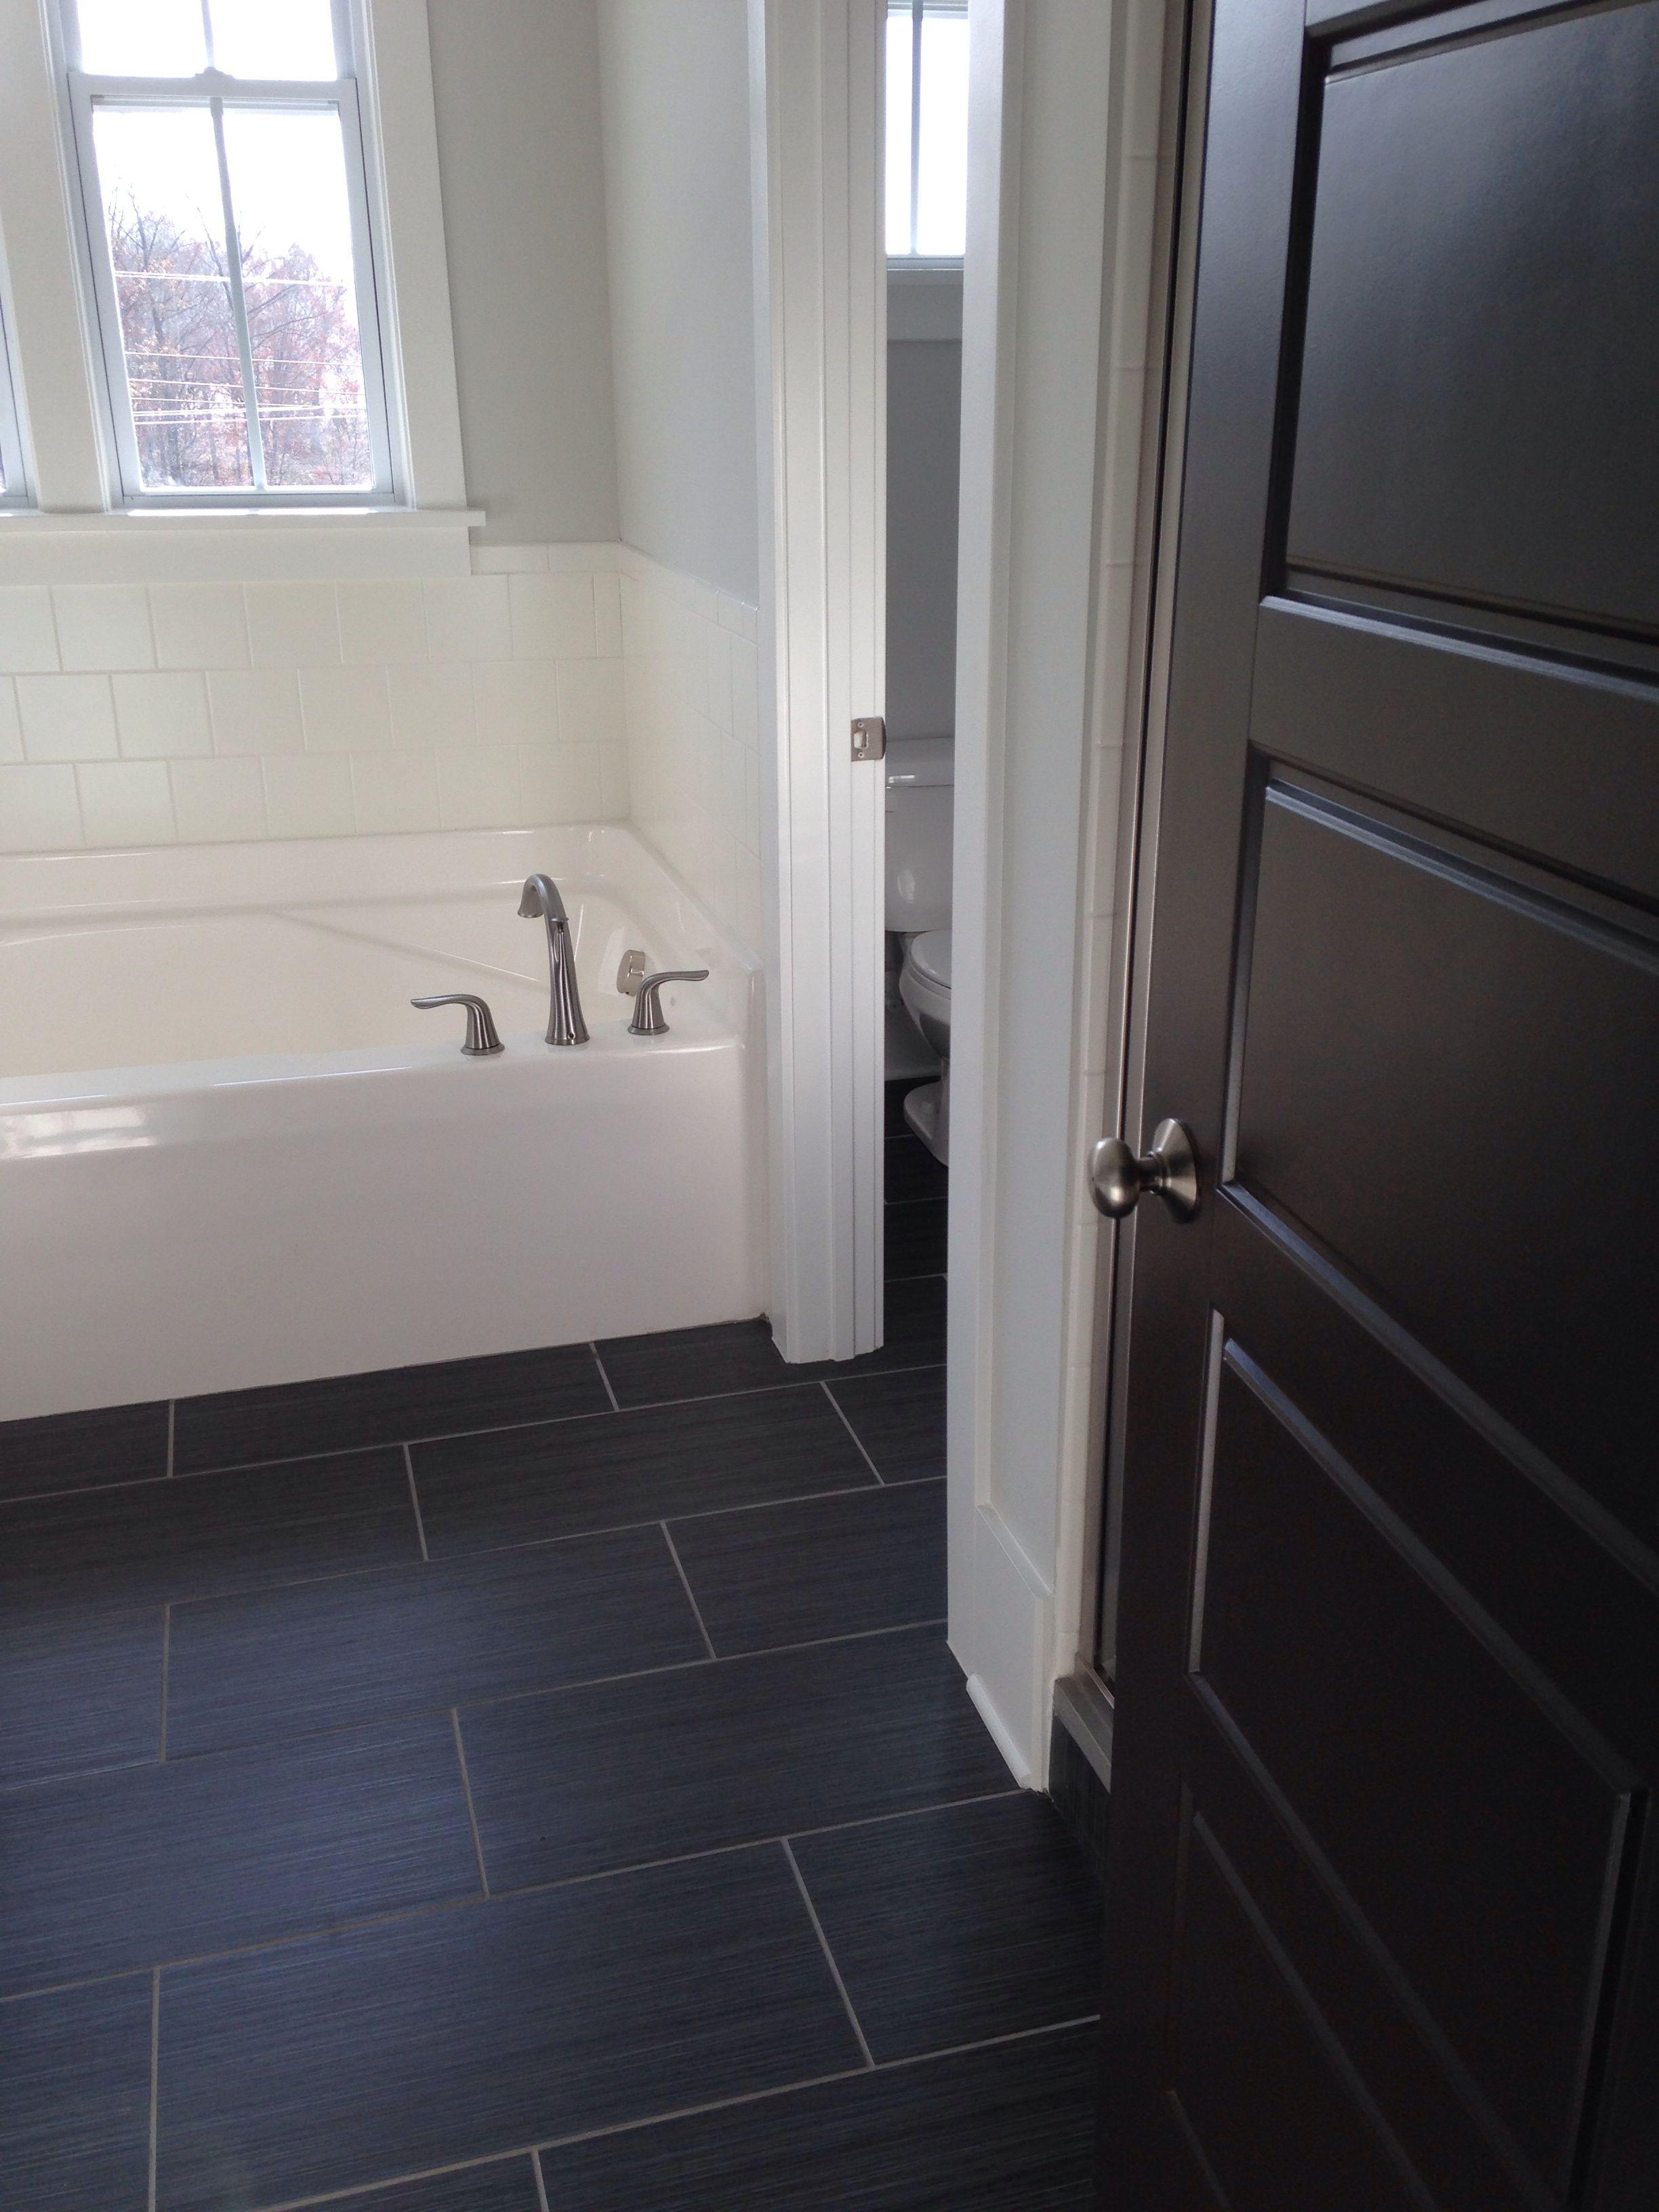 Master Bathroom Dark Tile Dark Doors, I Like The Tile And